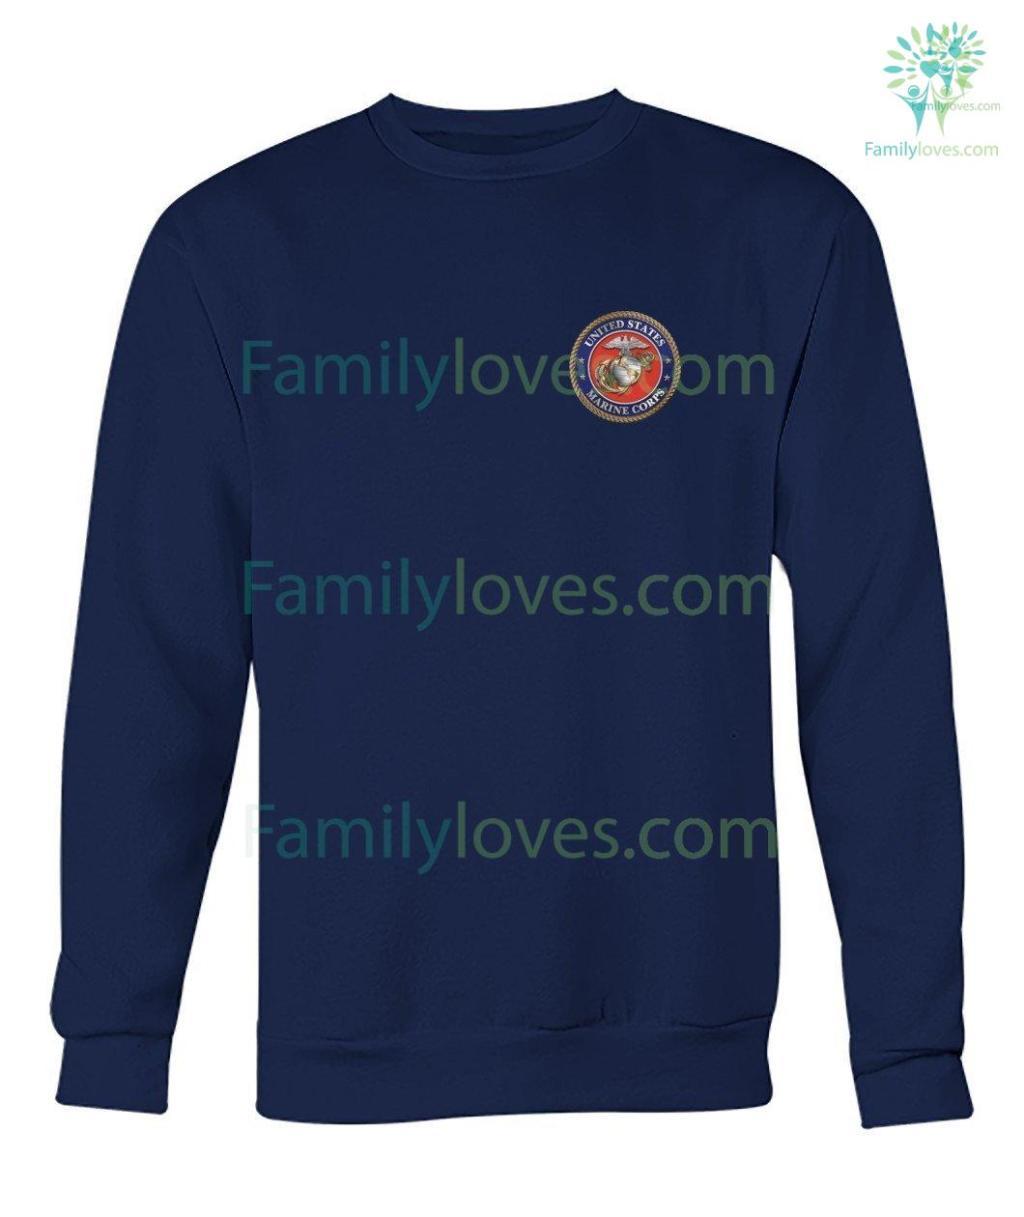 US MARINE GILDAN HOODIES Familyloves.com